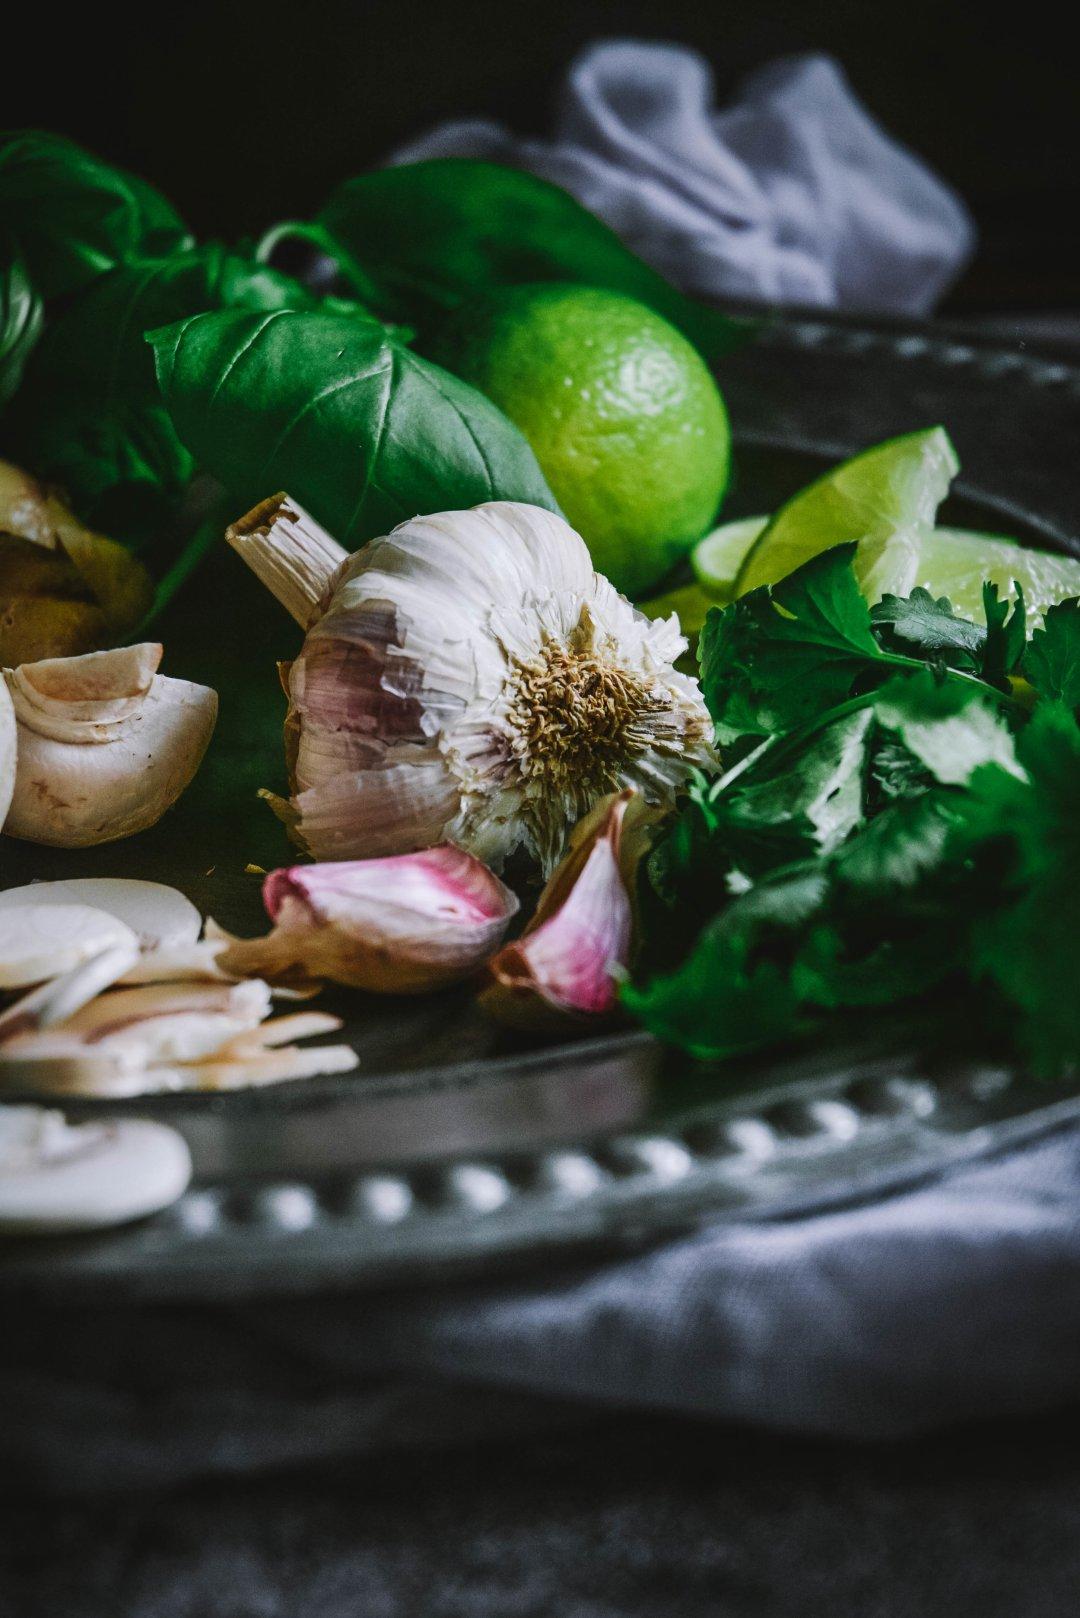 Garlic, basil and limes on plate